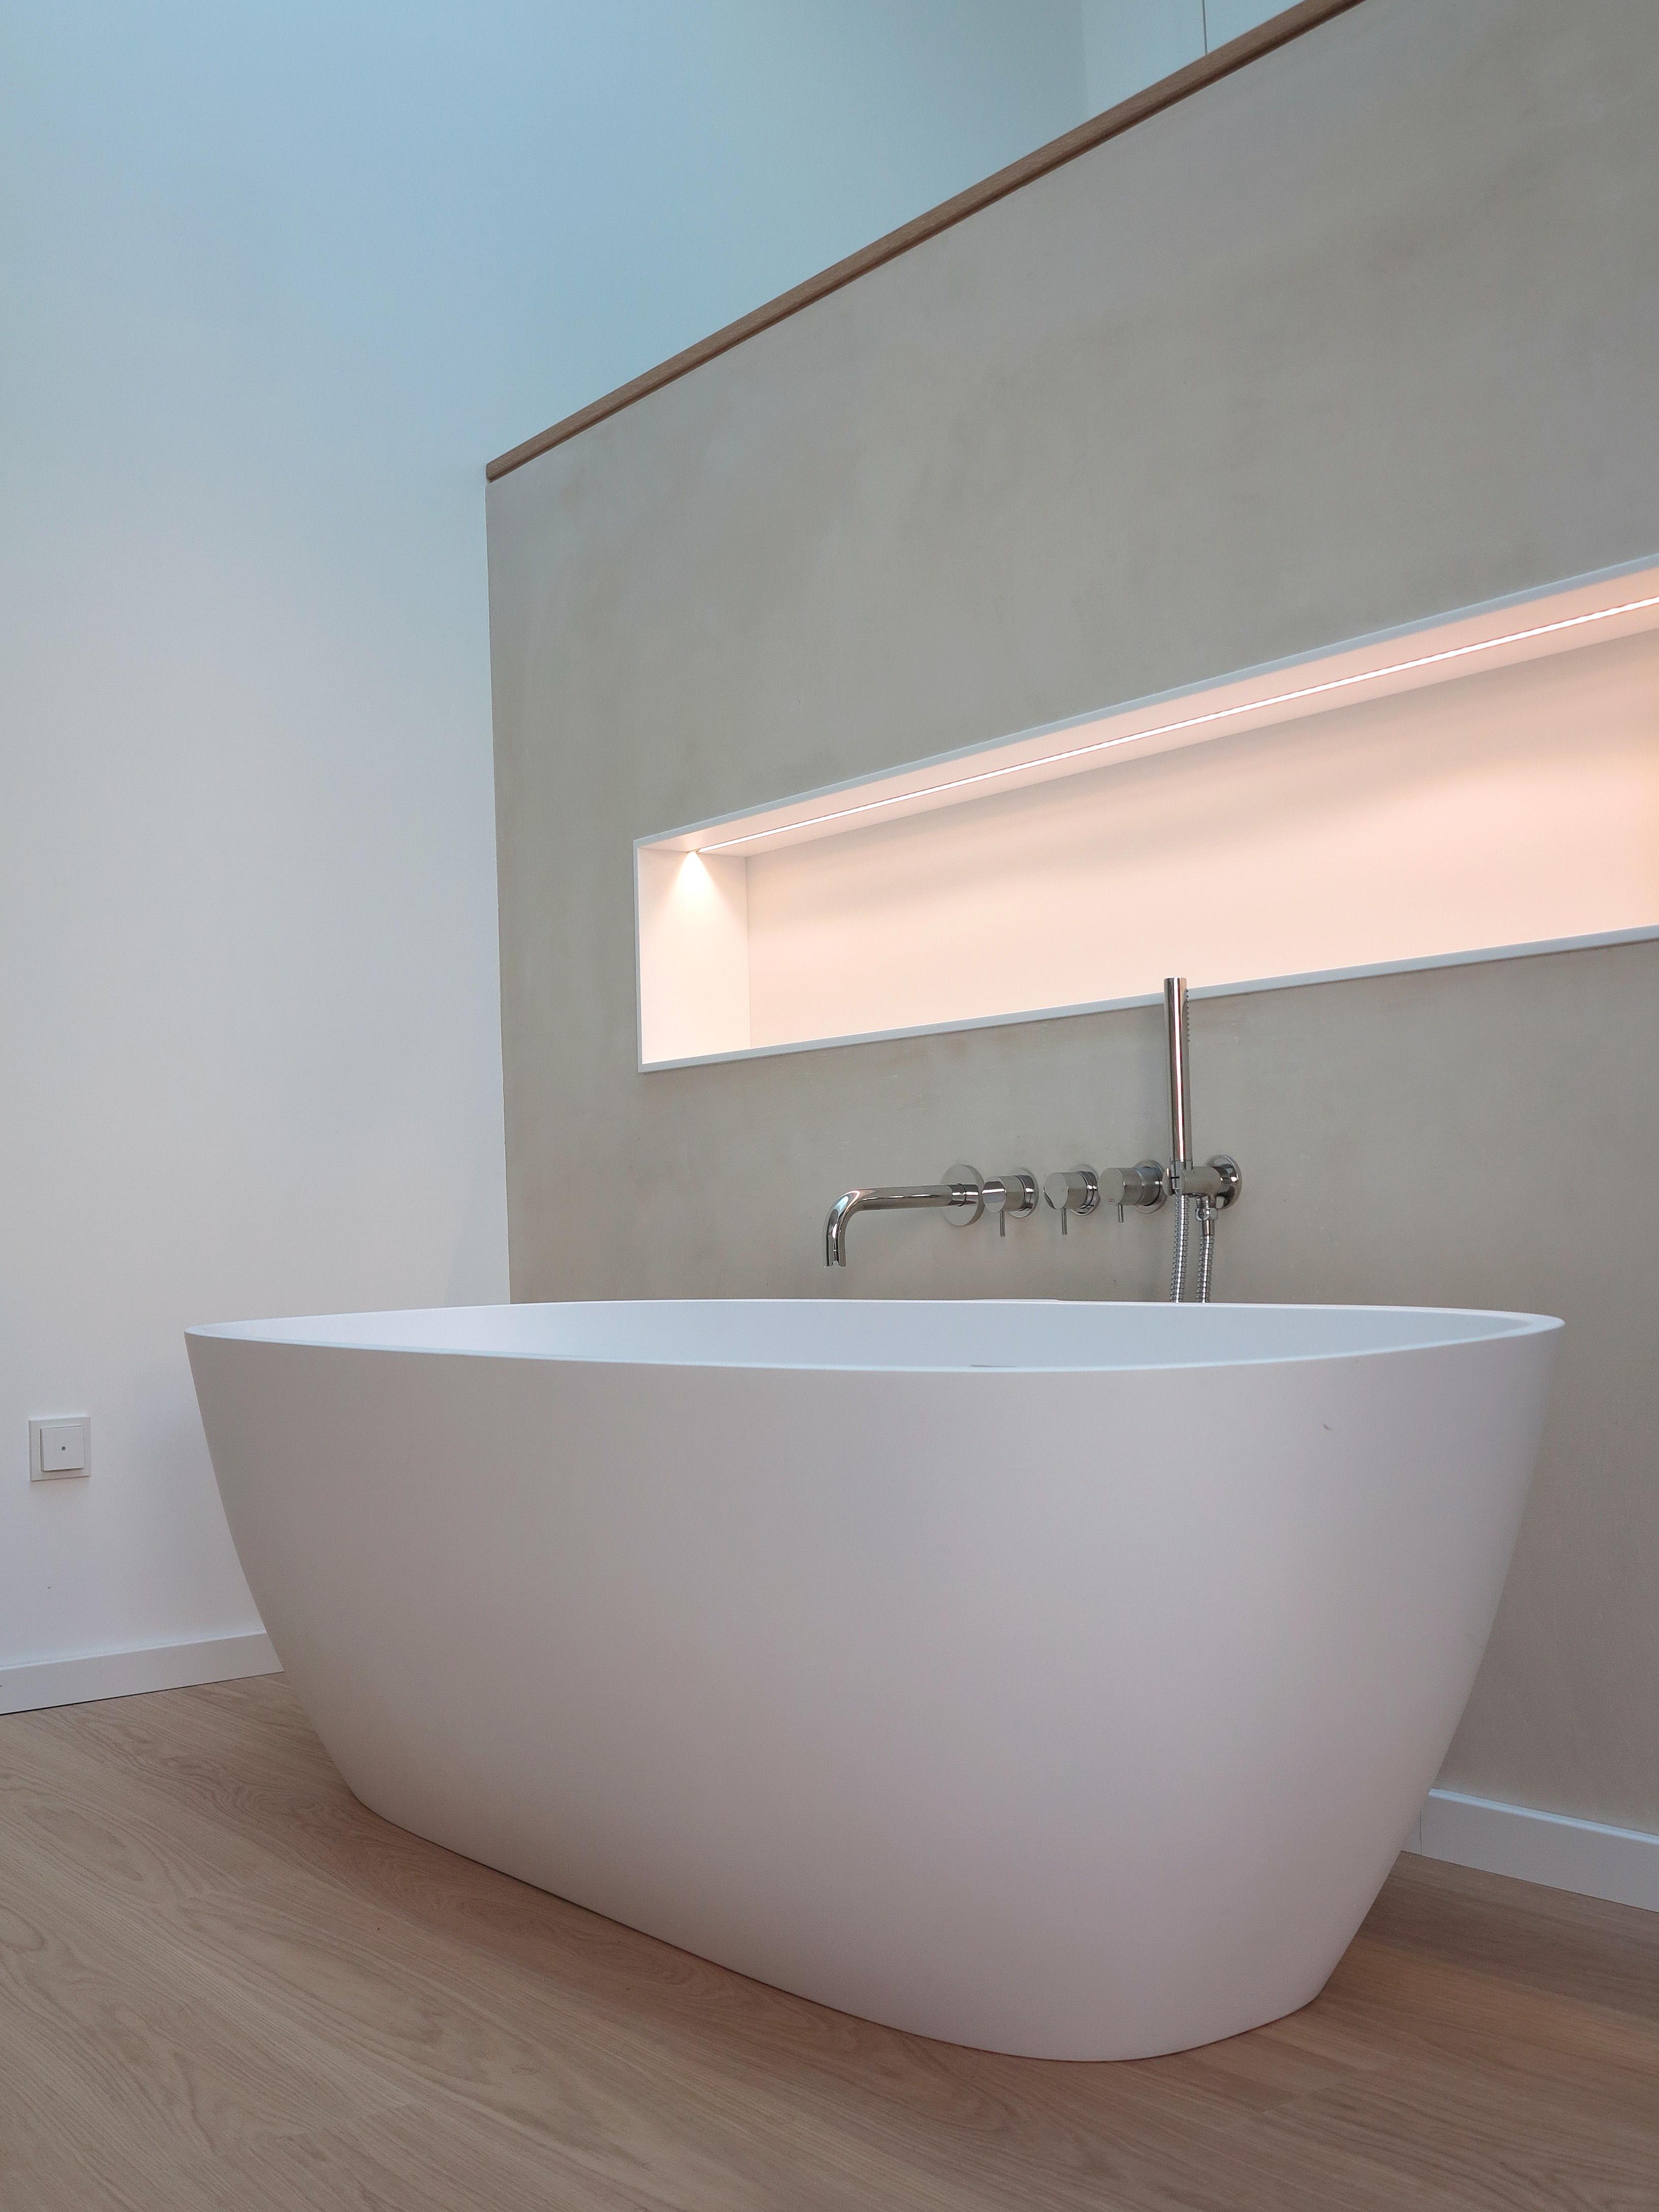 immobilien hochbau in bamberg infobel deutschland. Black Bedroom Furniture Sets. Home Design Ideas